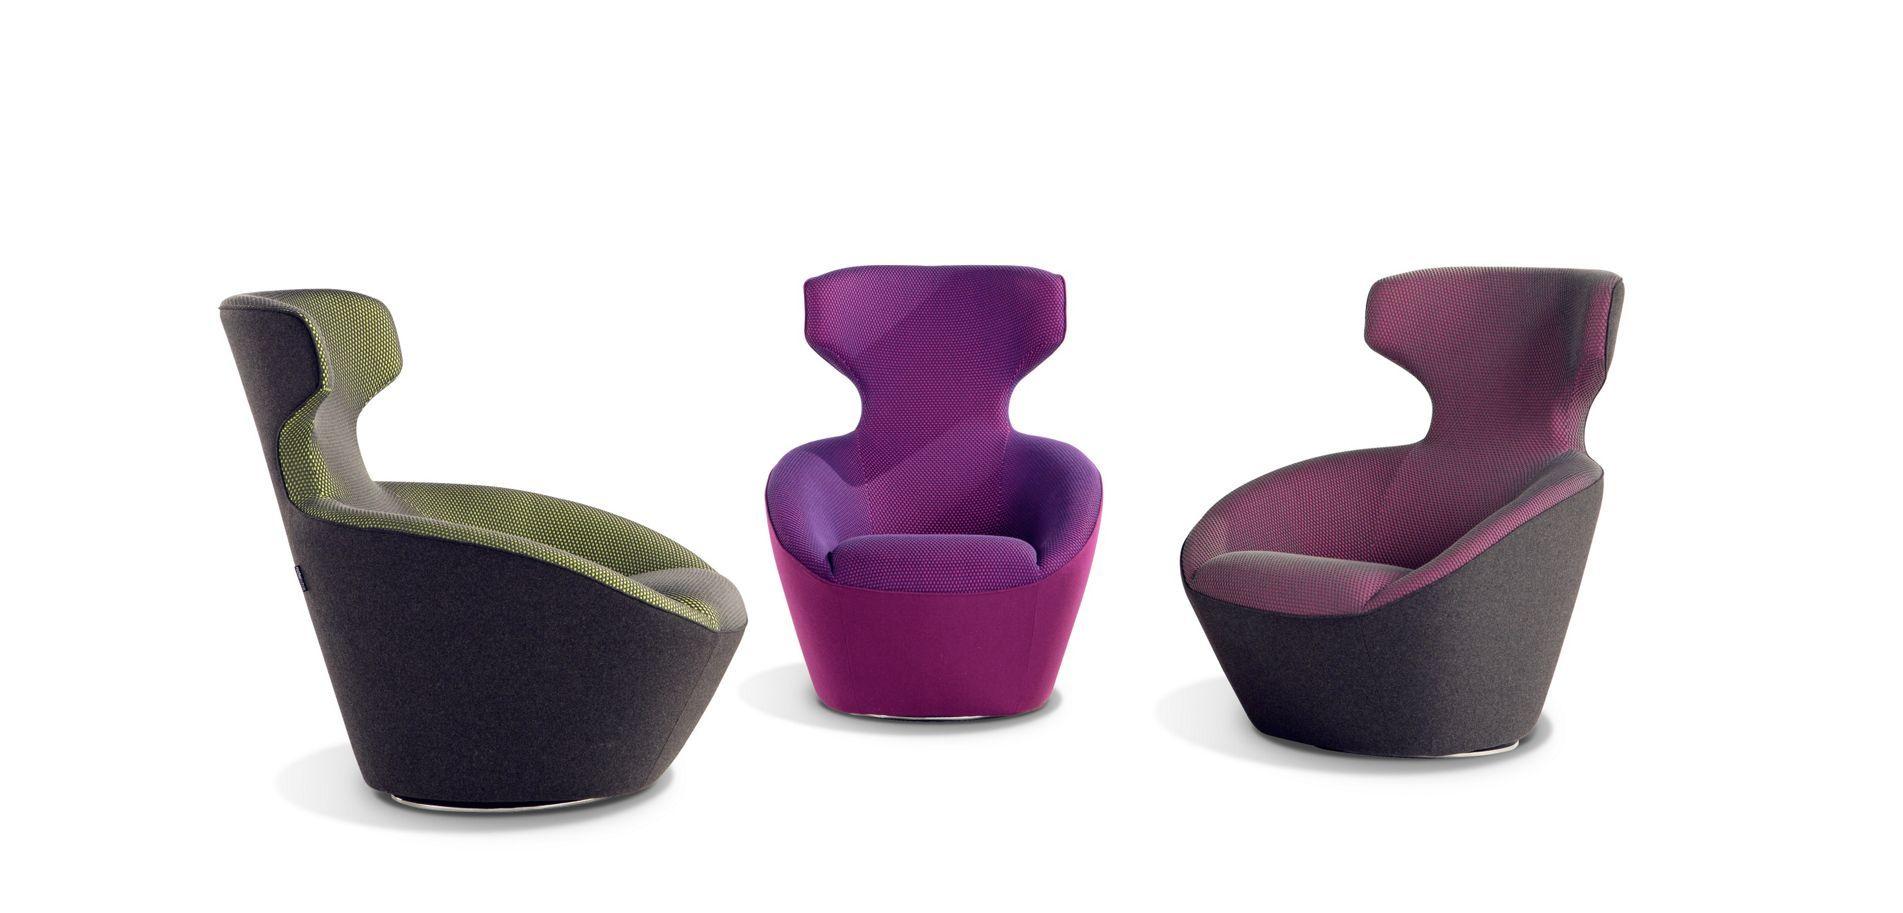 Super Edito Lounge Pivoting Armchair Armchairs Roche Bobois Beatyapartments Chair Design Images Beatyapartmentscom